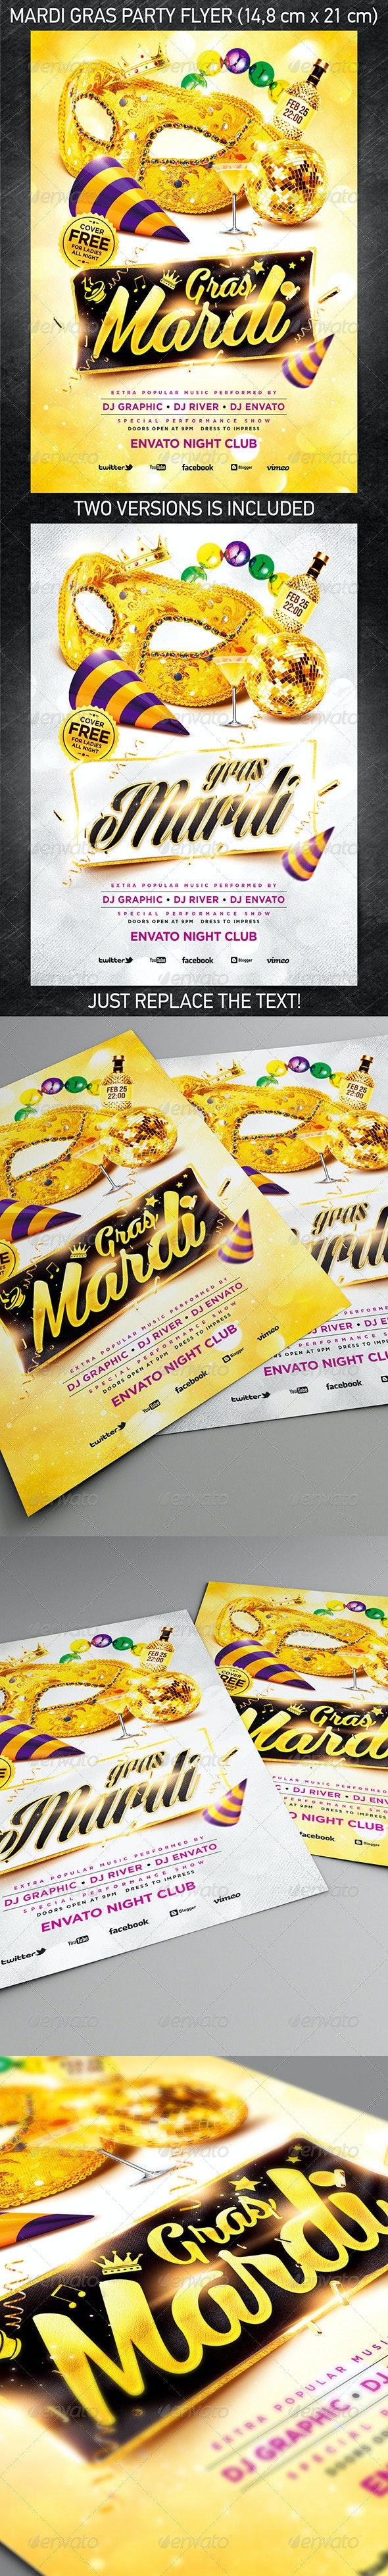 Mardi Gras Party Flyer Vol.3 - Holidays Events